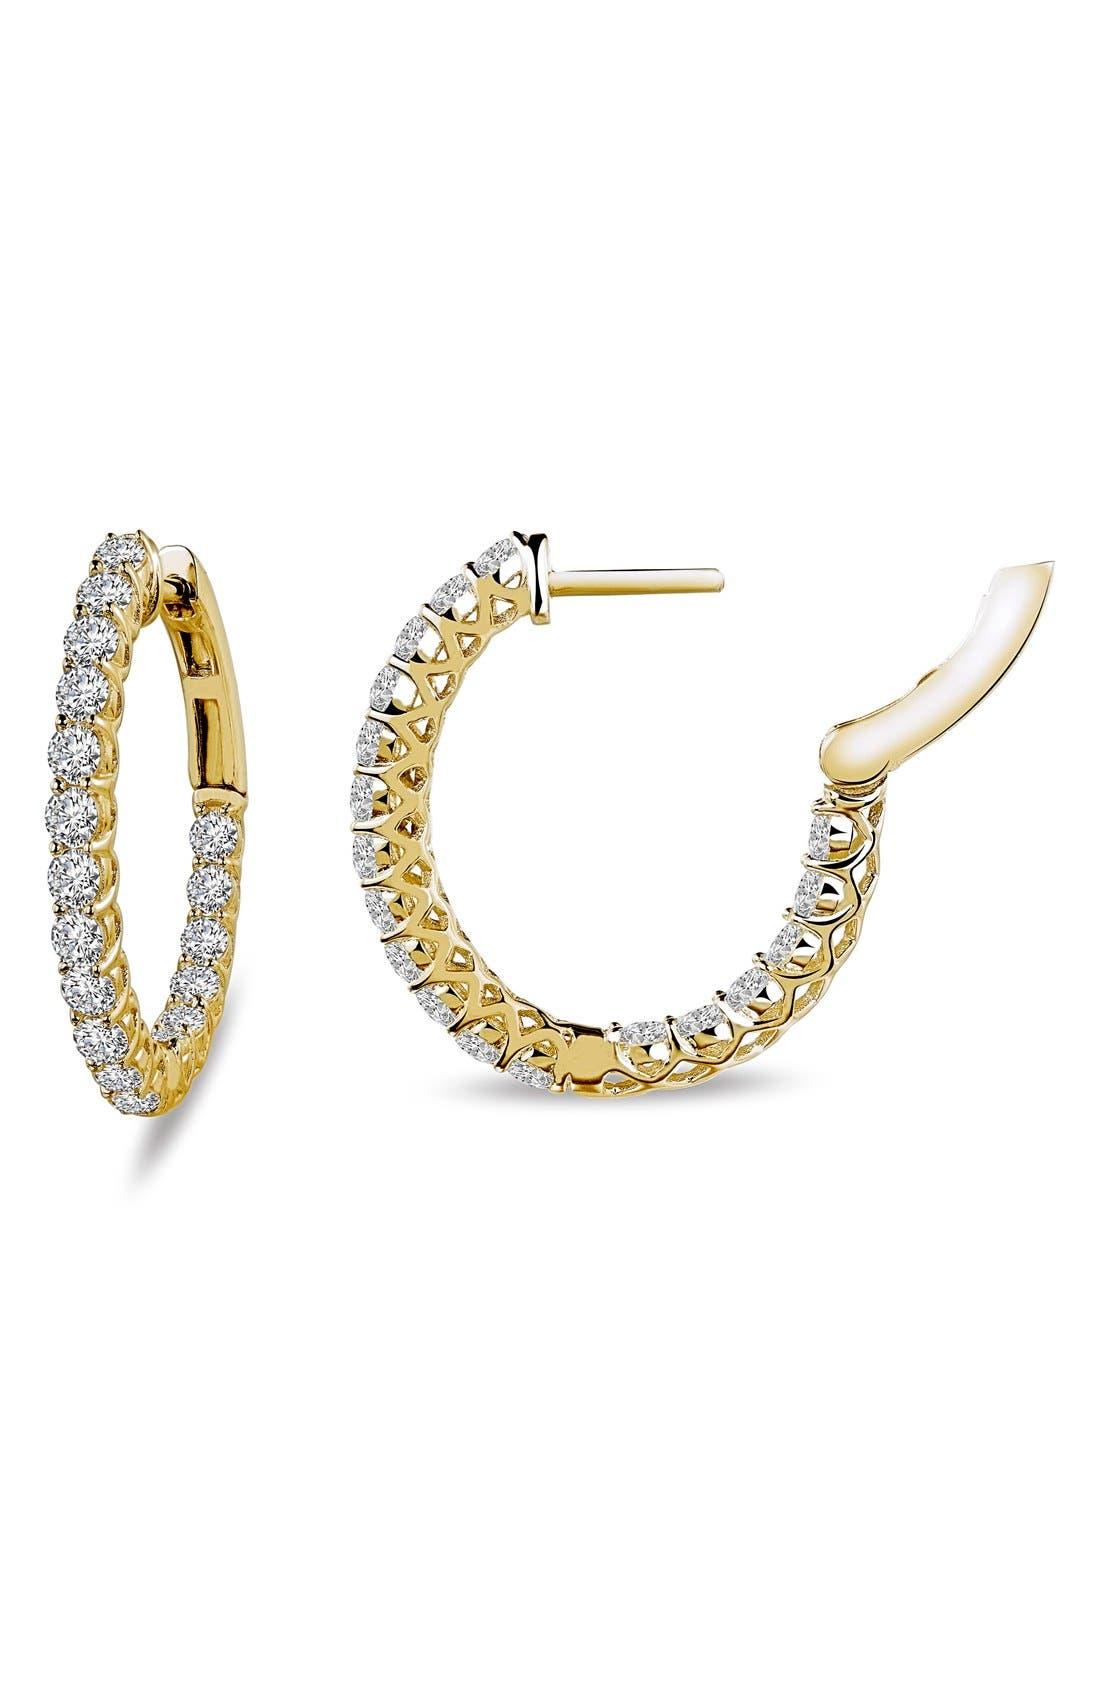 Alternate Image 1 Selected - Lafonn 'Lassaire' Hoop Earrings